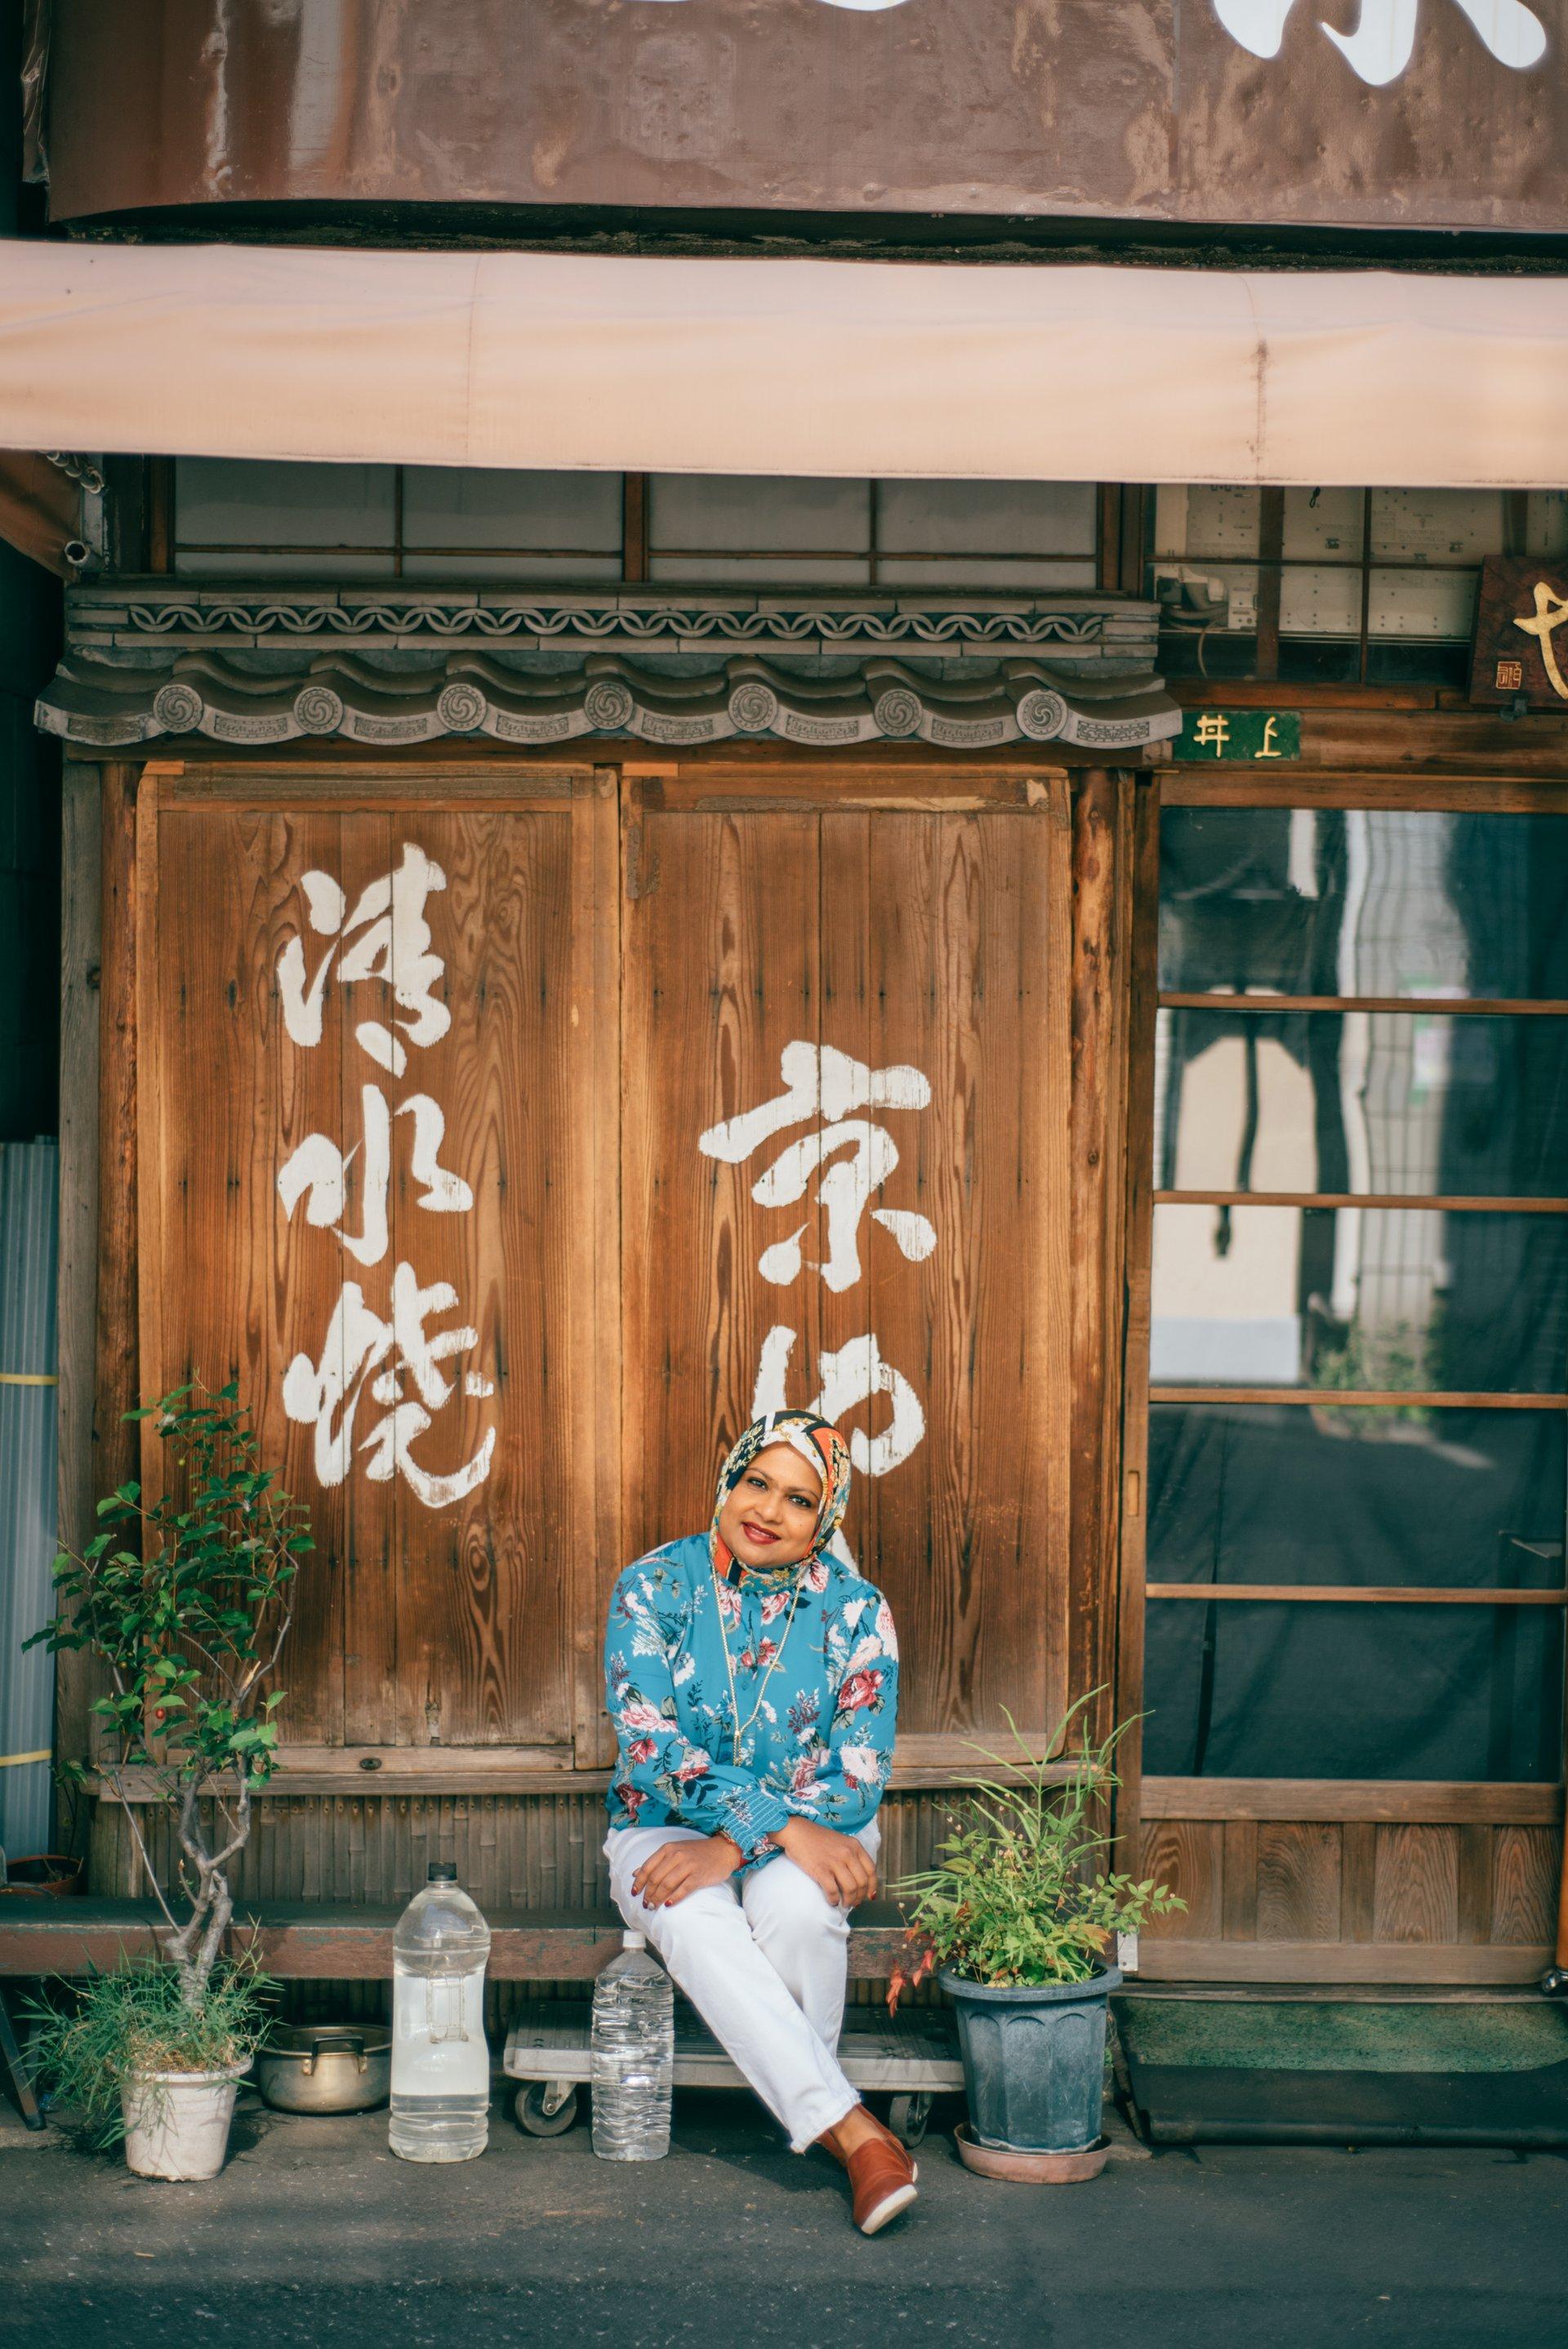 Tokyo-Japan-travel-story-Flytographer-10